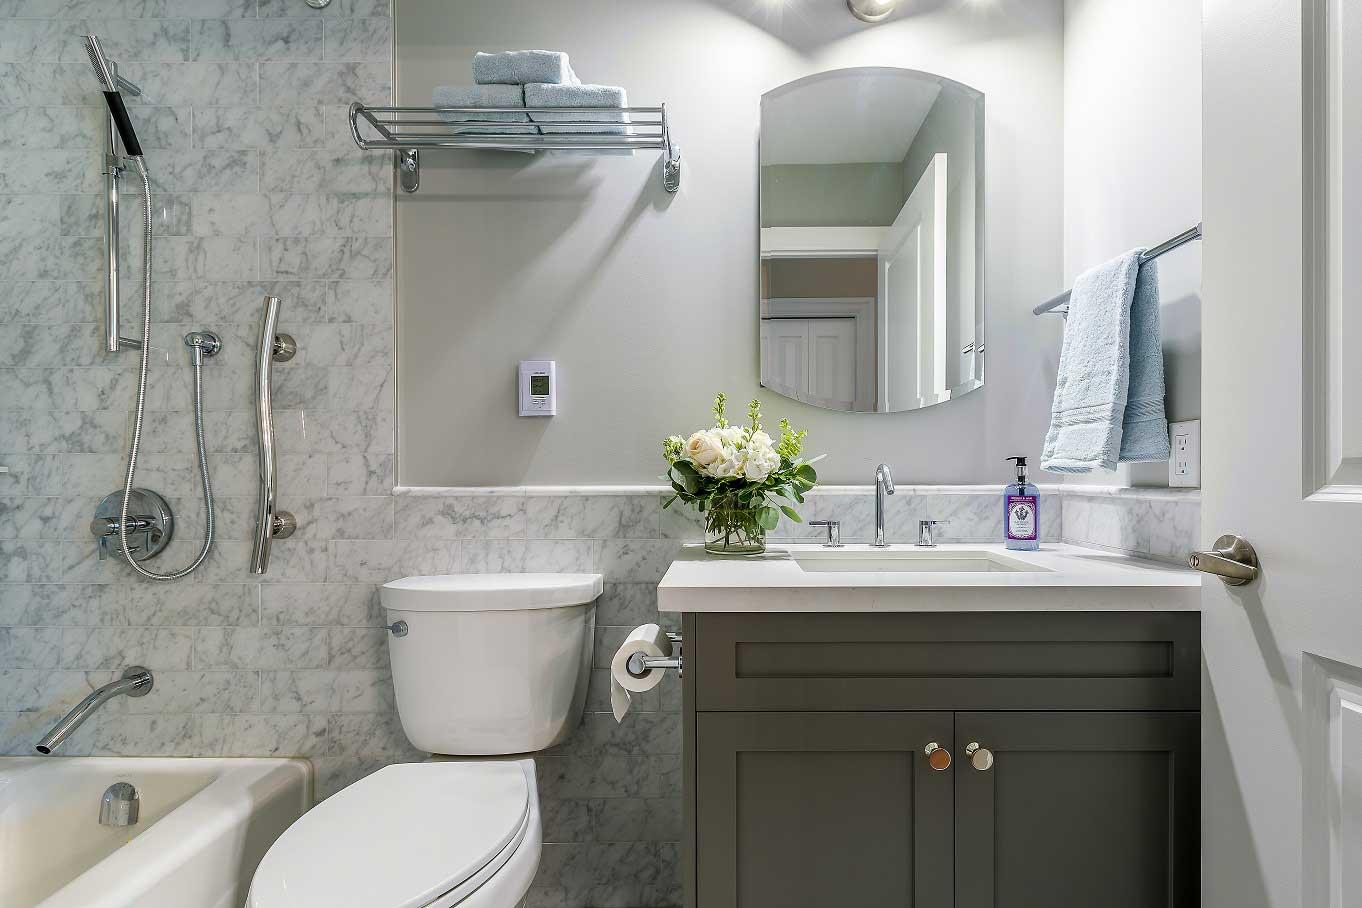 ccr-renovations-whitby-modern-bathroom-vanity